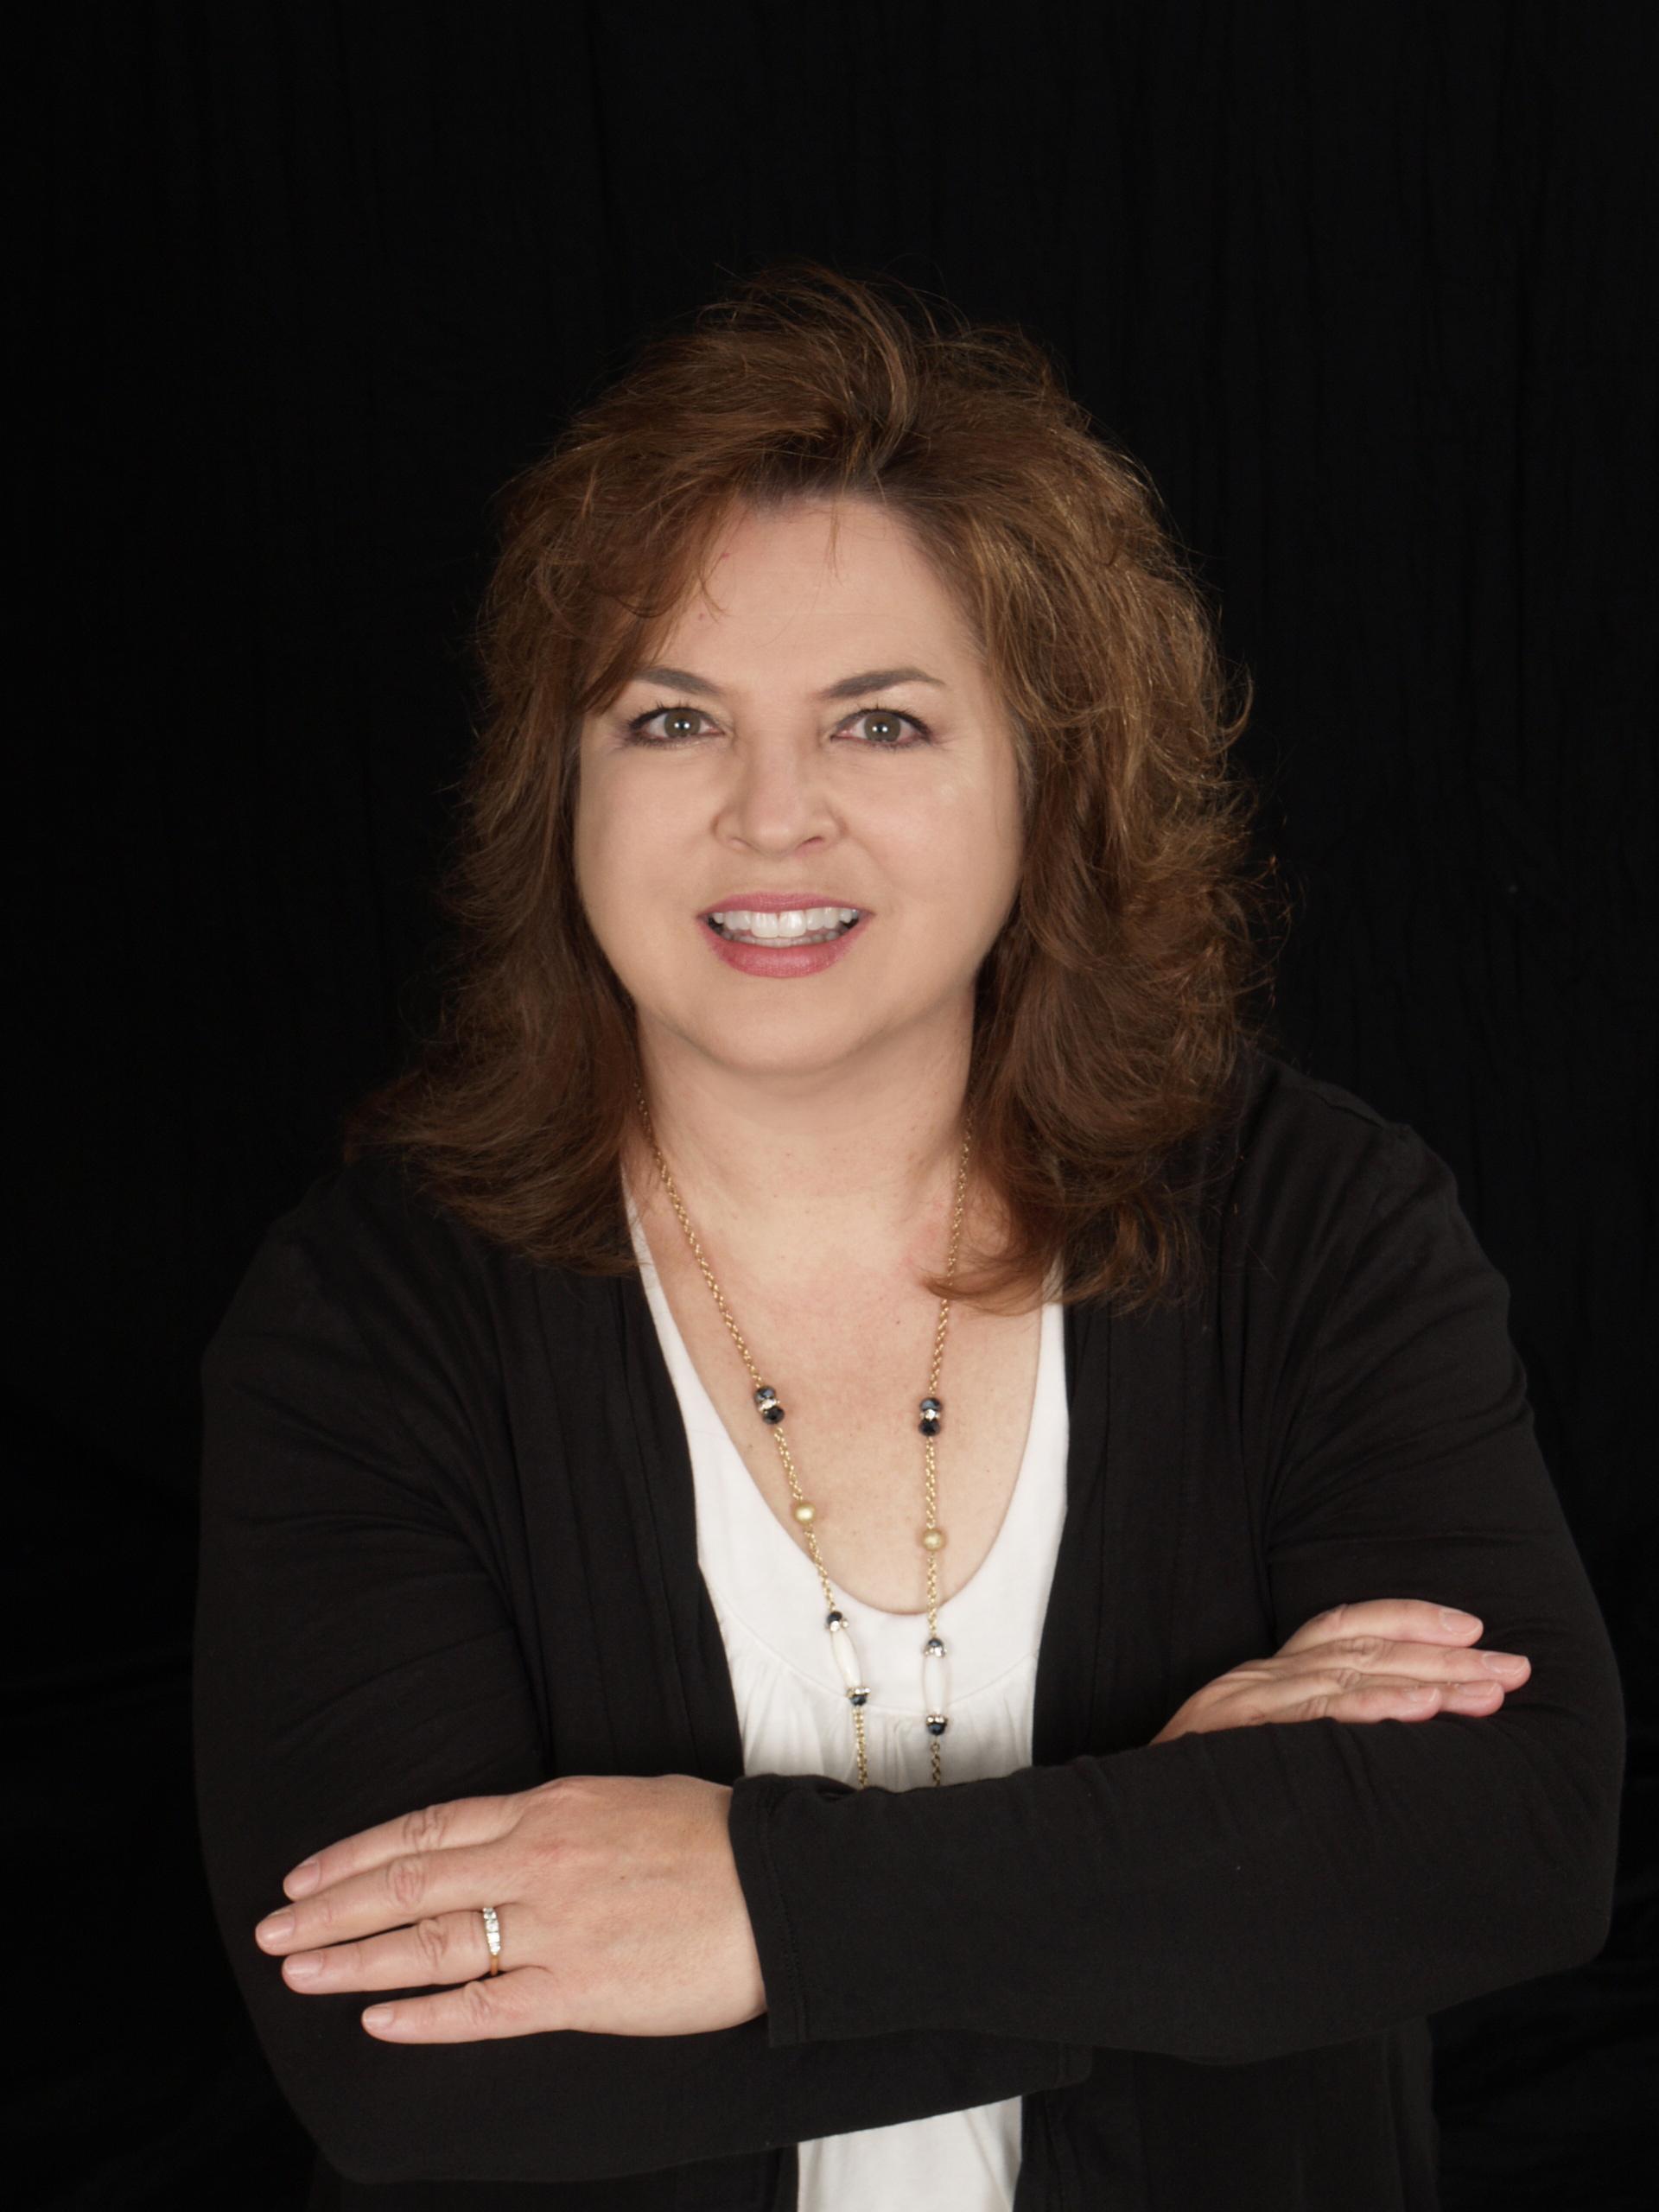 Teresa Professional Pictures - 2014.jpg